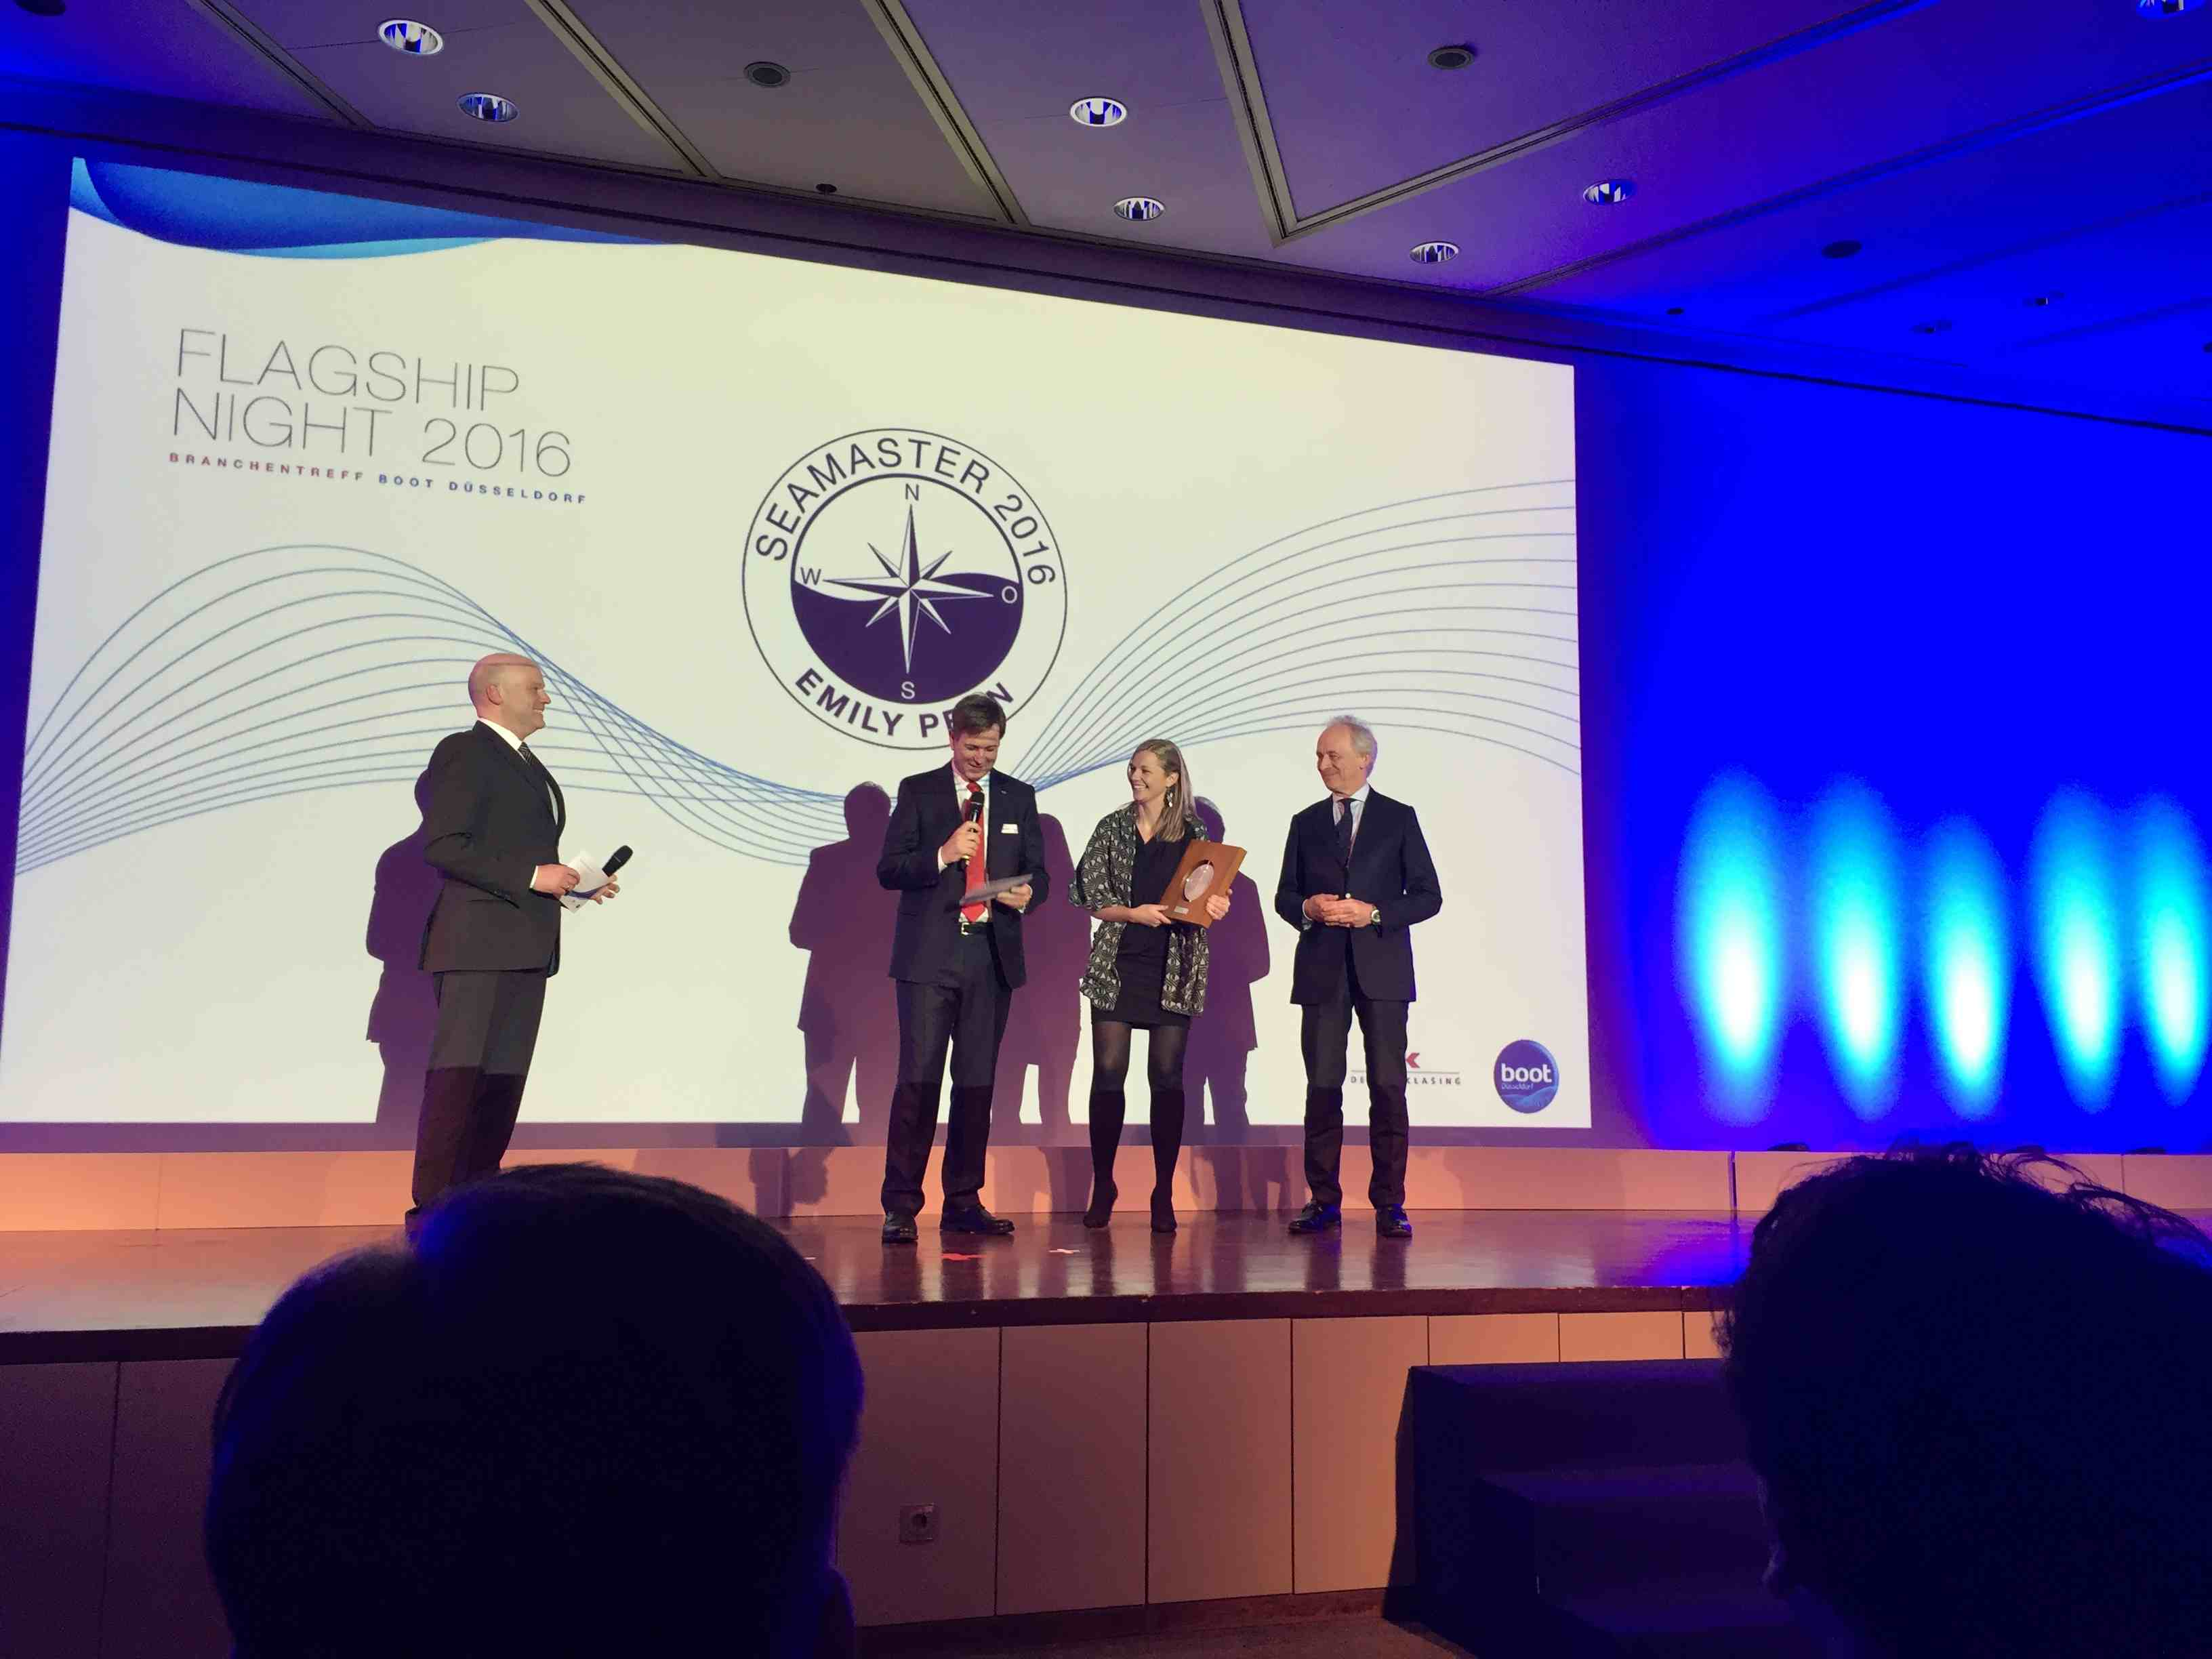 Emily Penn, flankiert Messechef Götz Jungmichel (l. ) und Verlagsboss Konrad Delius nimmt den Seamaster-Award entgegen. Foto: John Burnham/boats.com